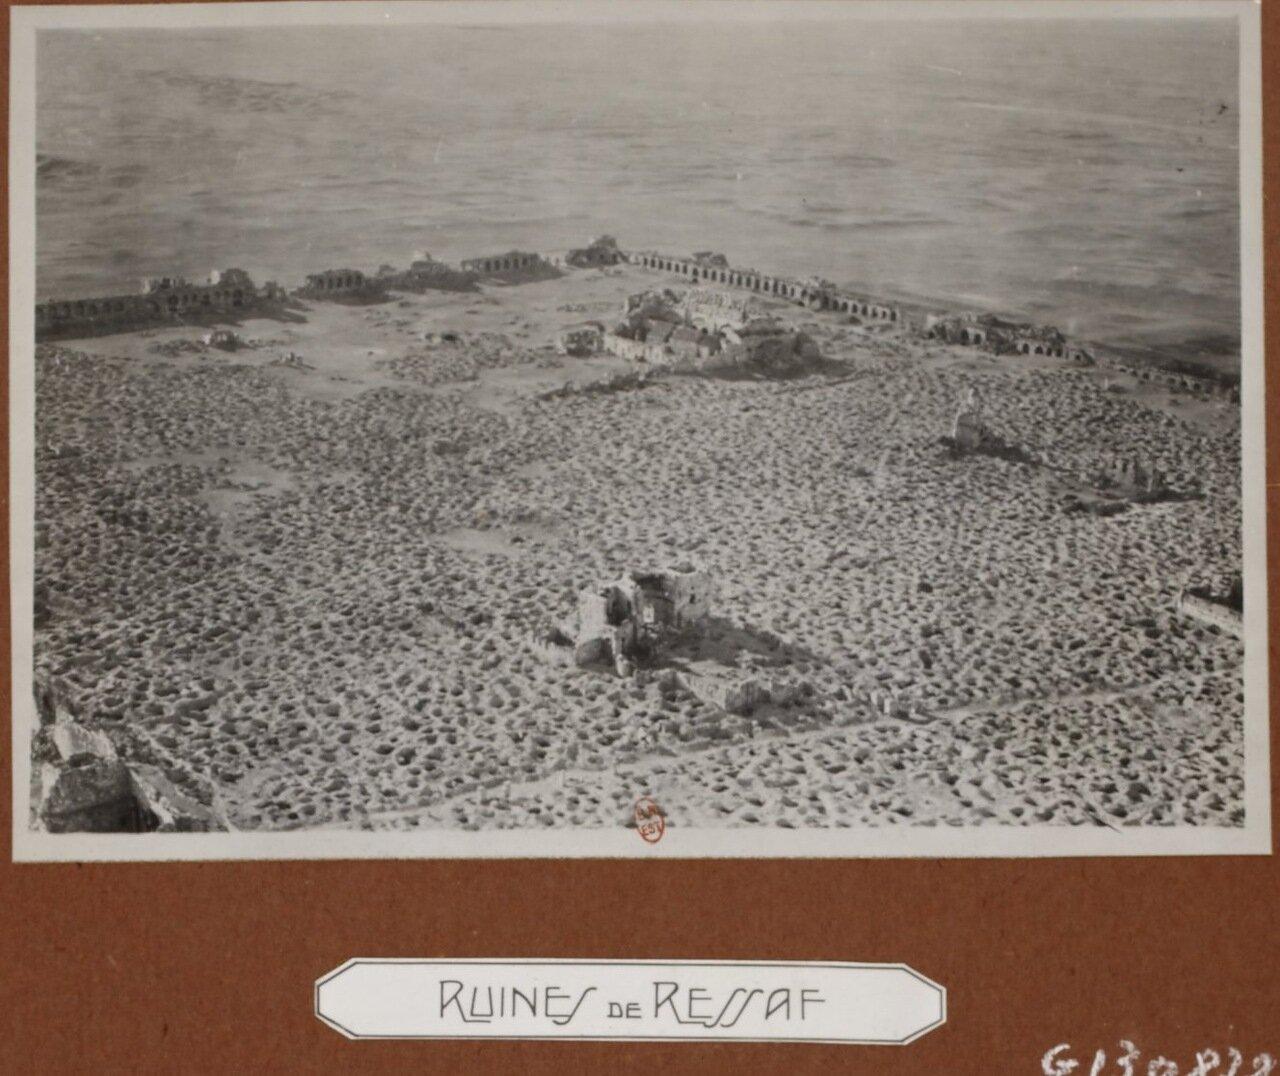 Руины Рессафа